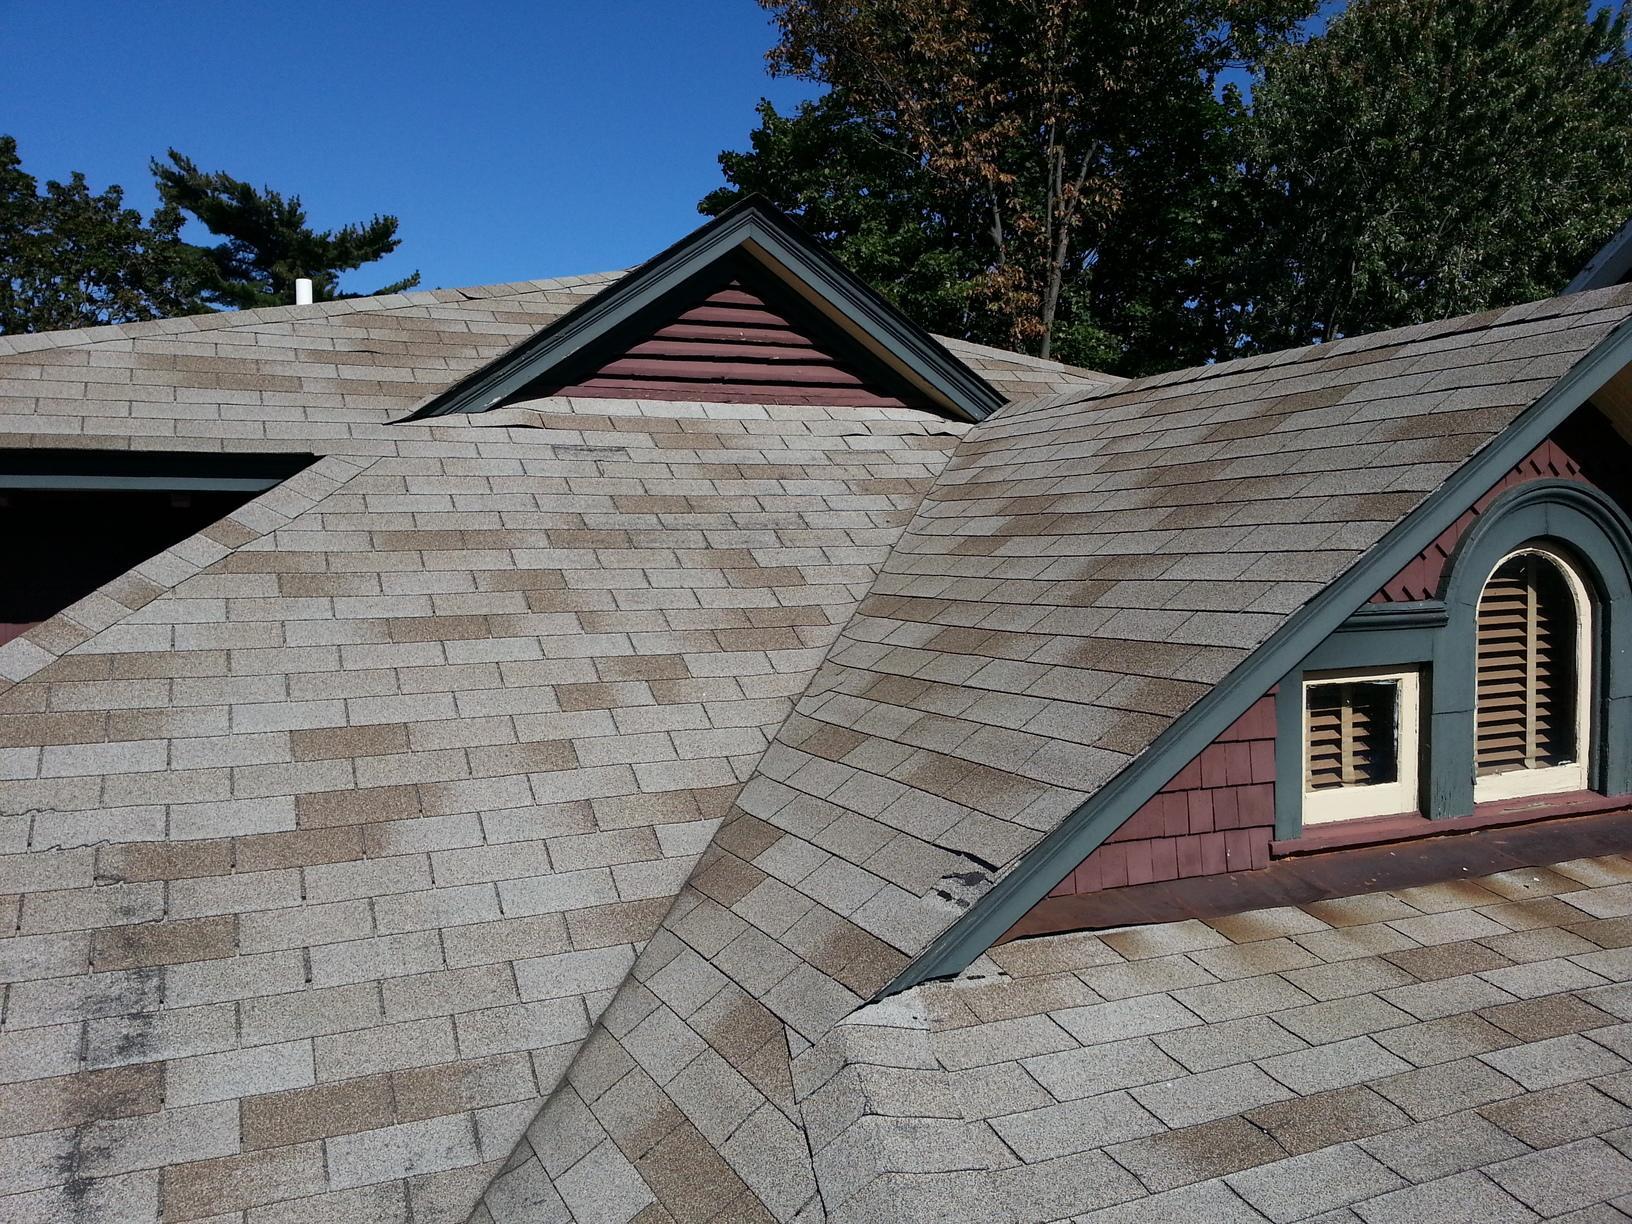 Asphalt Shingle Roof Replacement in Riverton, NJ